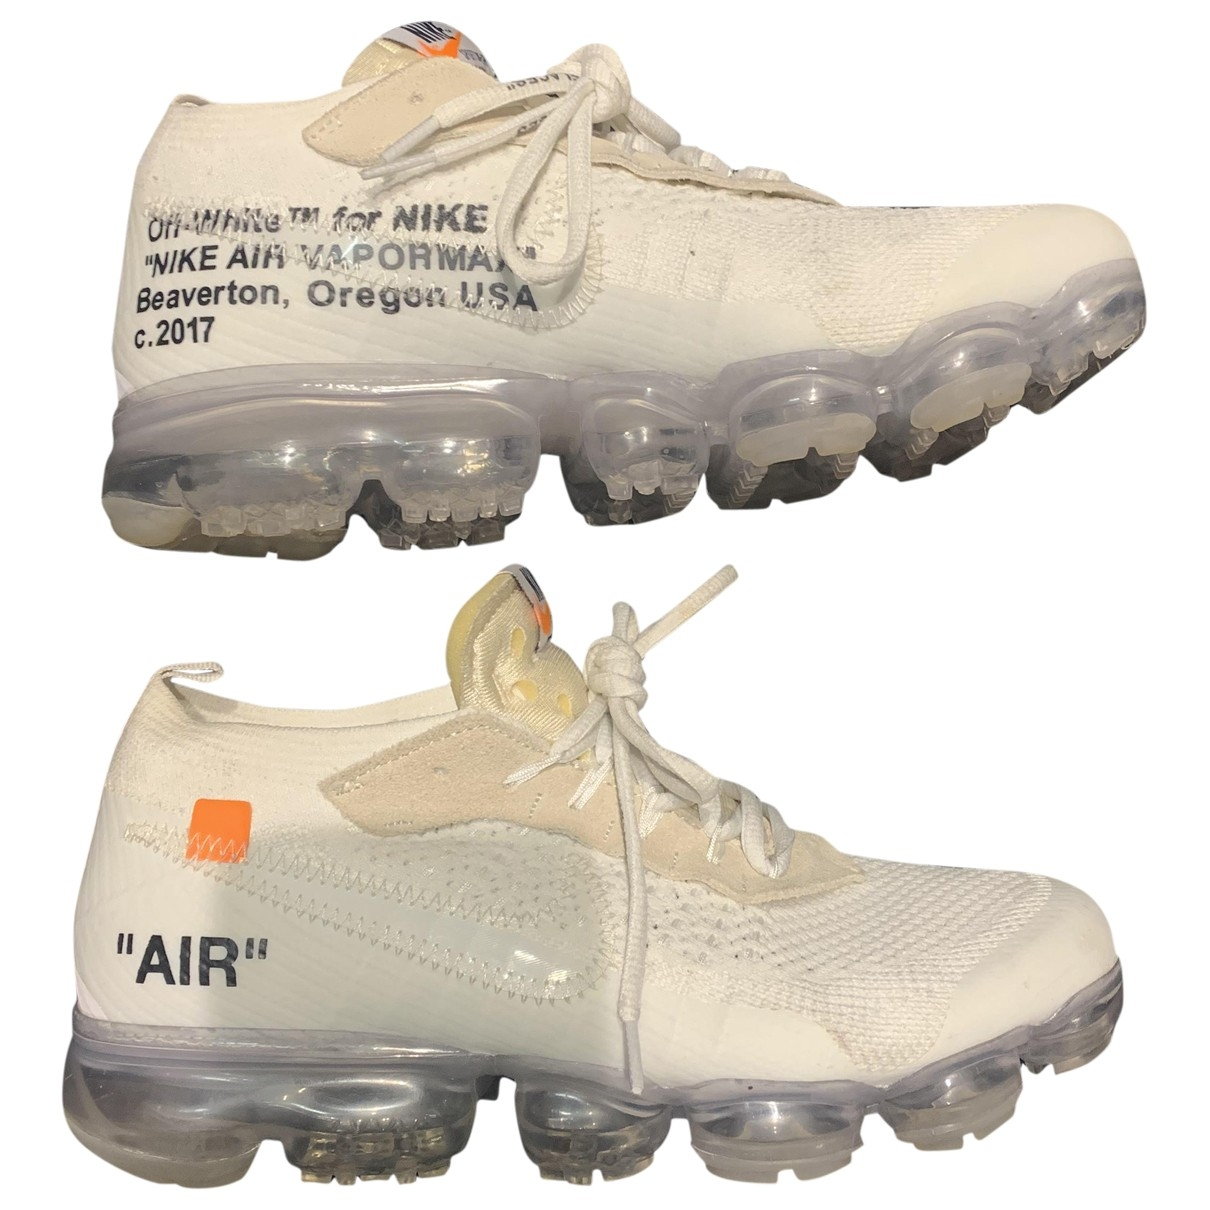 Nike X Off-white - Baskets Vapormax pour homme en toile - blanc